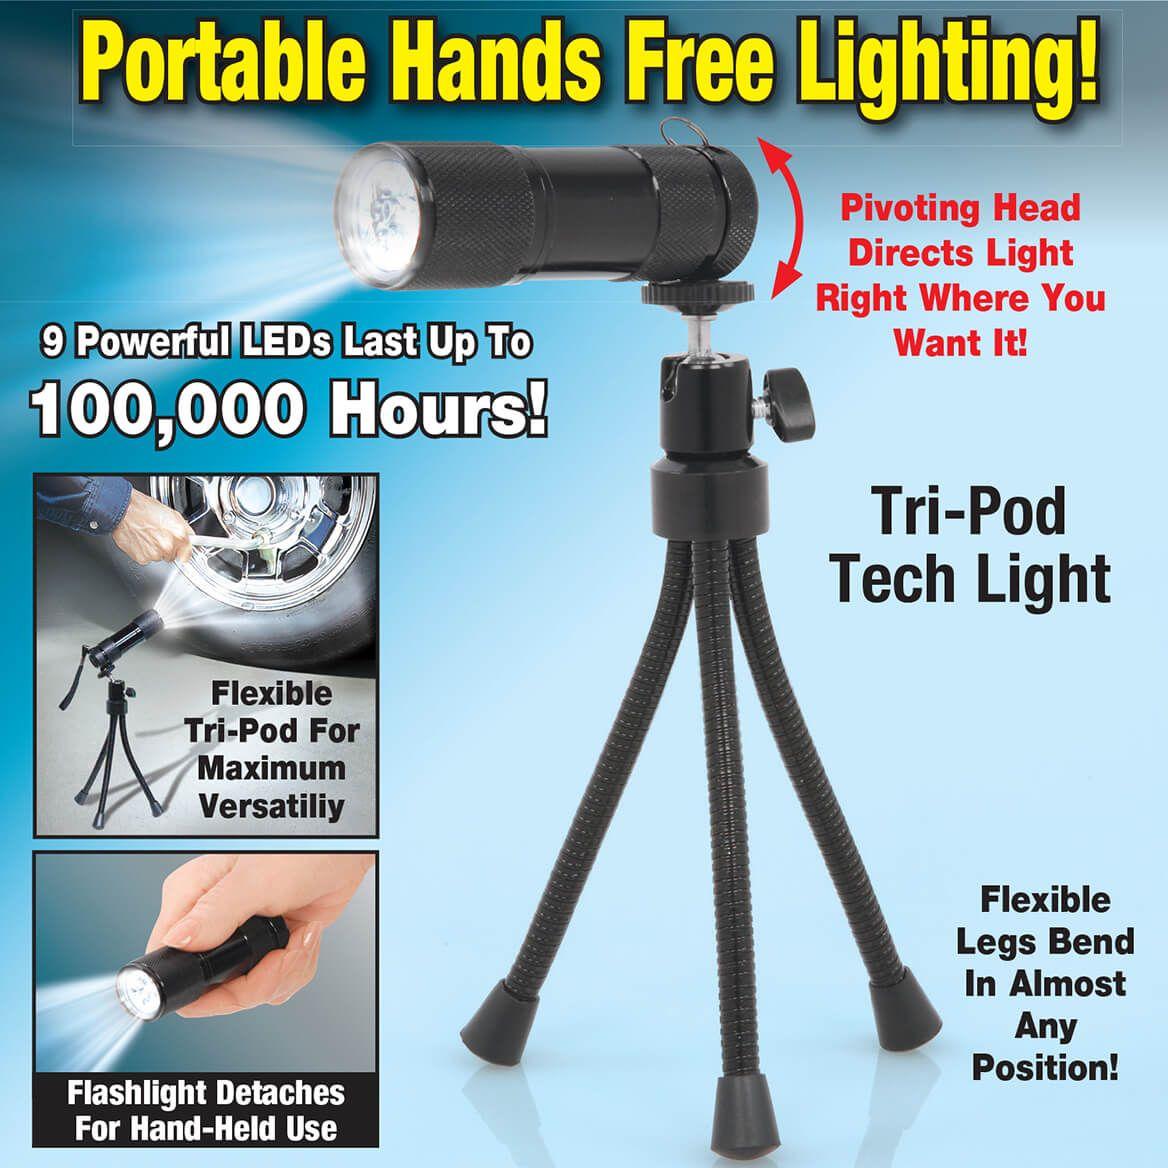 Tri-Pod Tech Light-370026